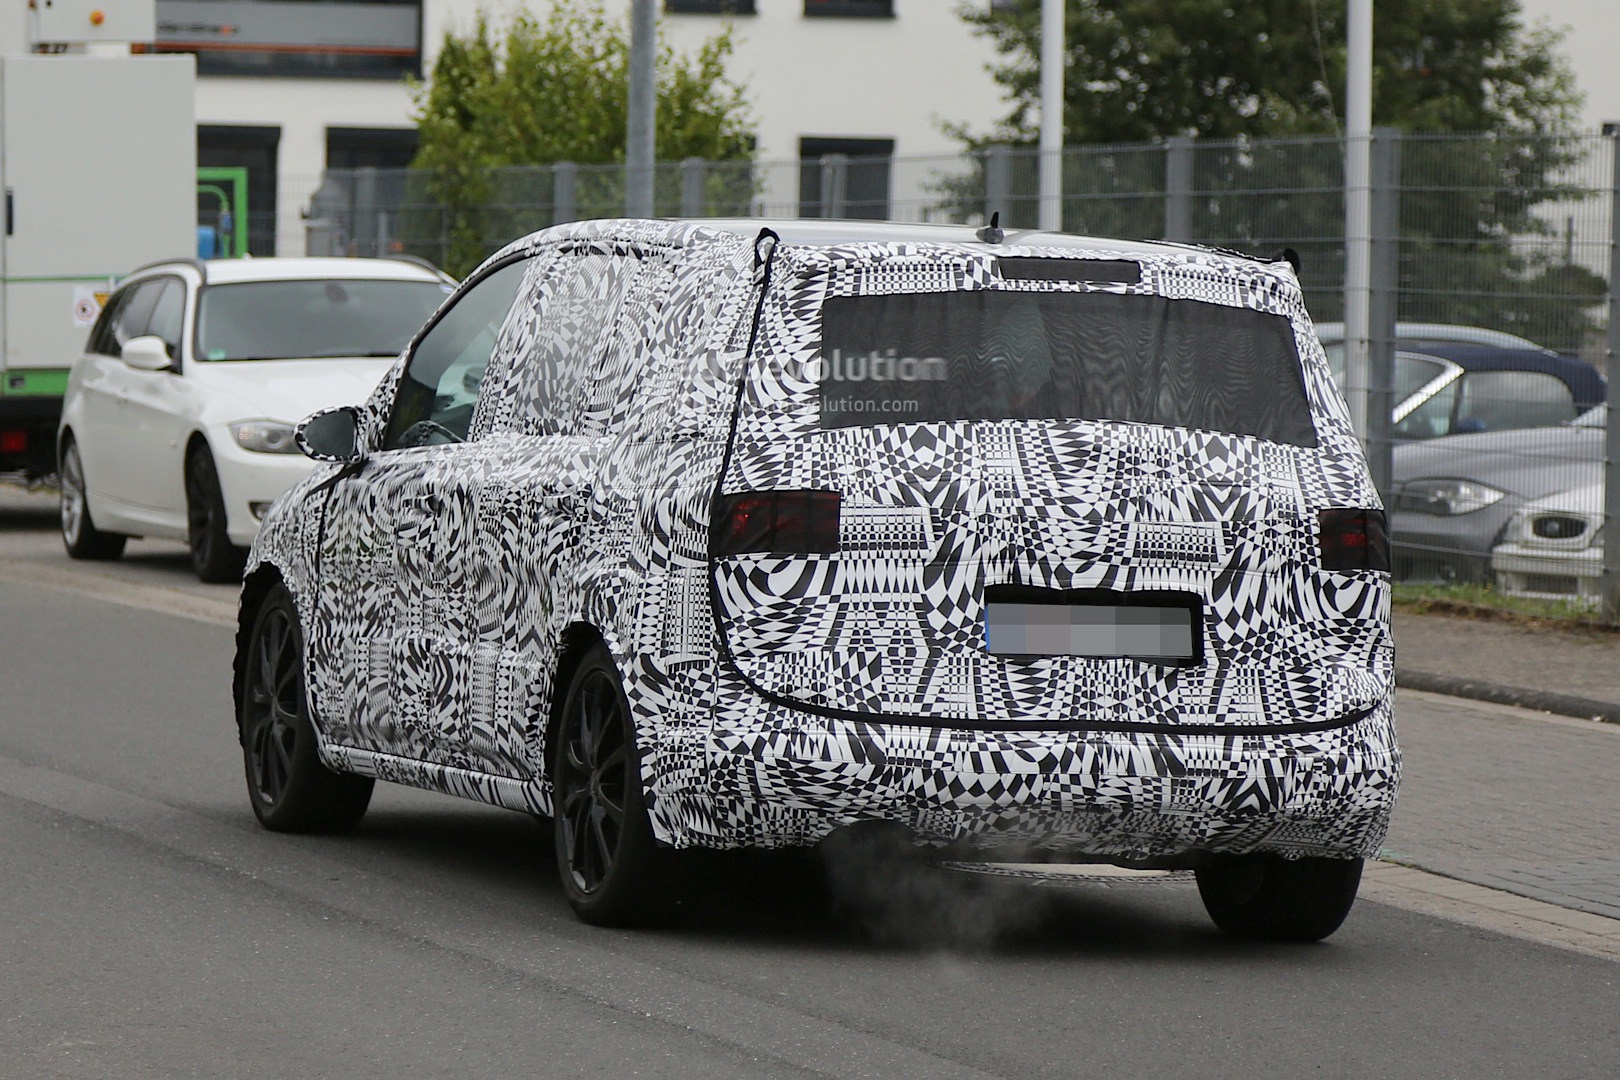 2015 - [Volkswagen] Touran - Page 3 2015-volkswagen-touran-spied-with-led-headlights_7